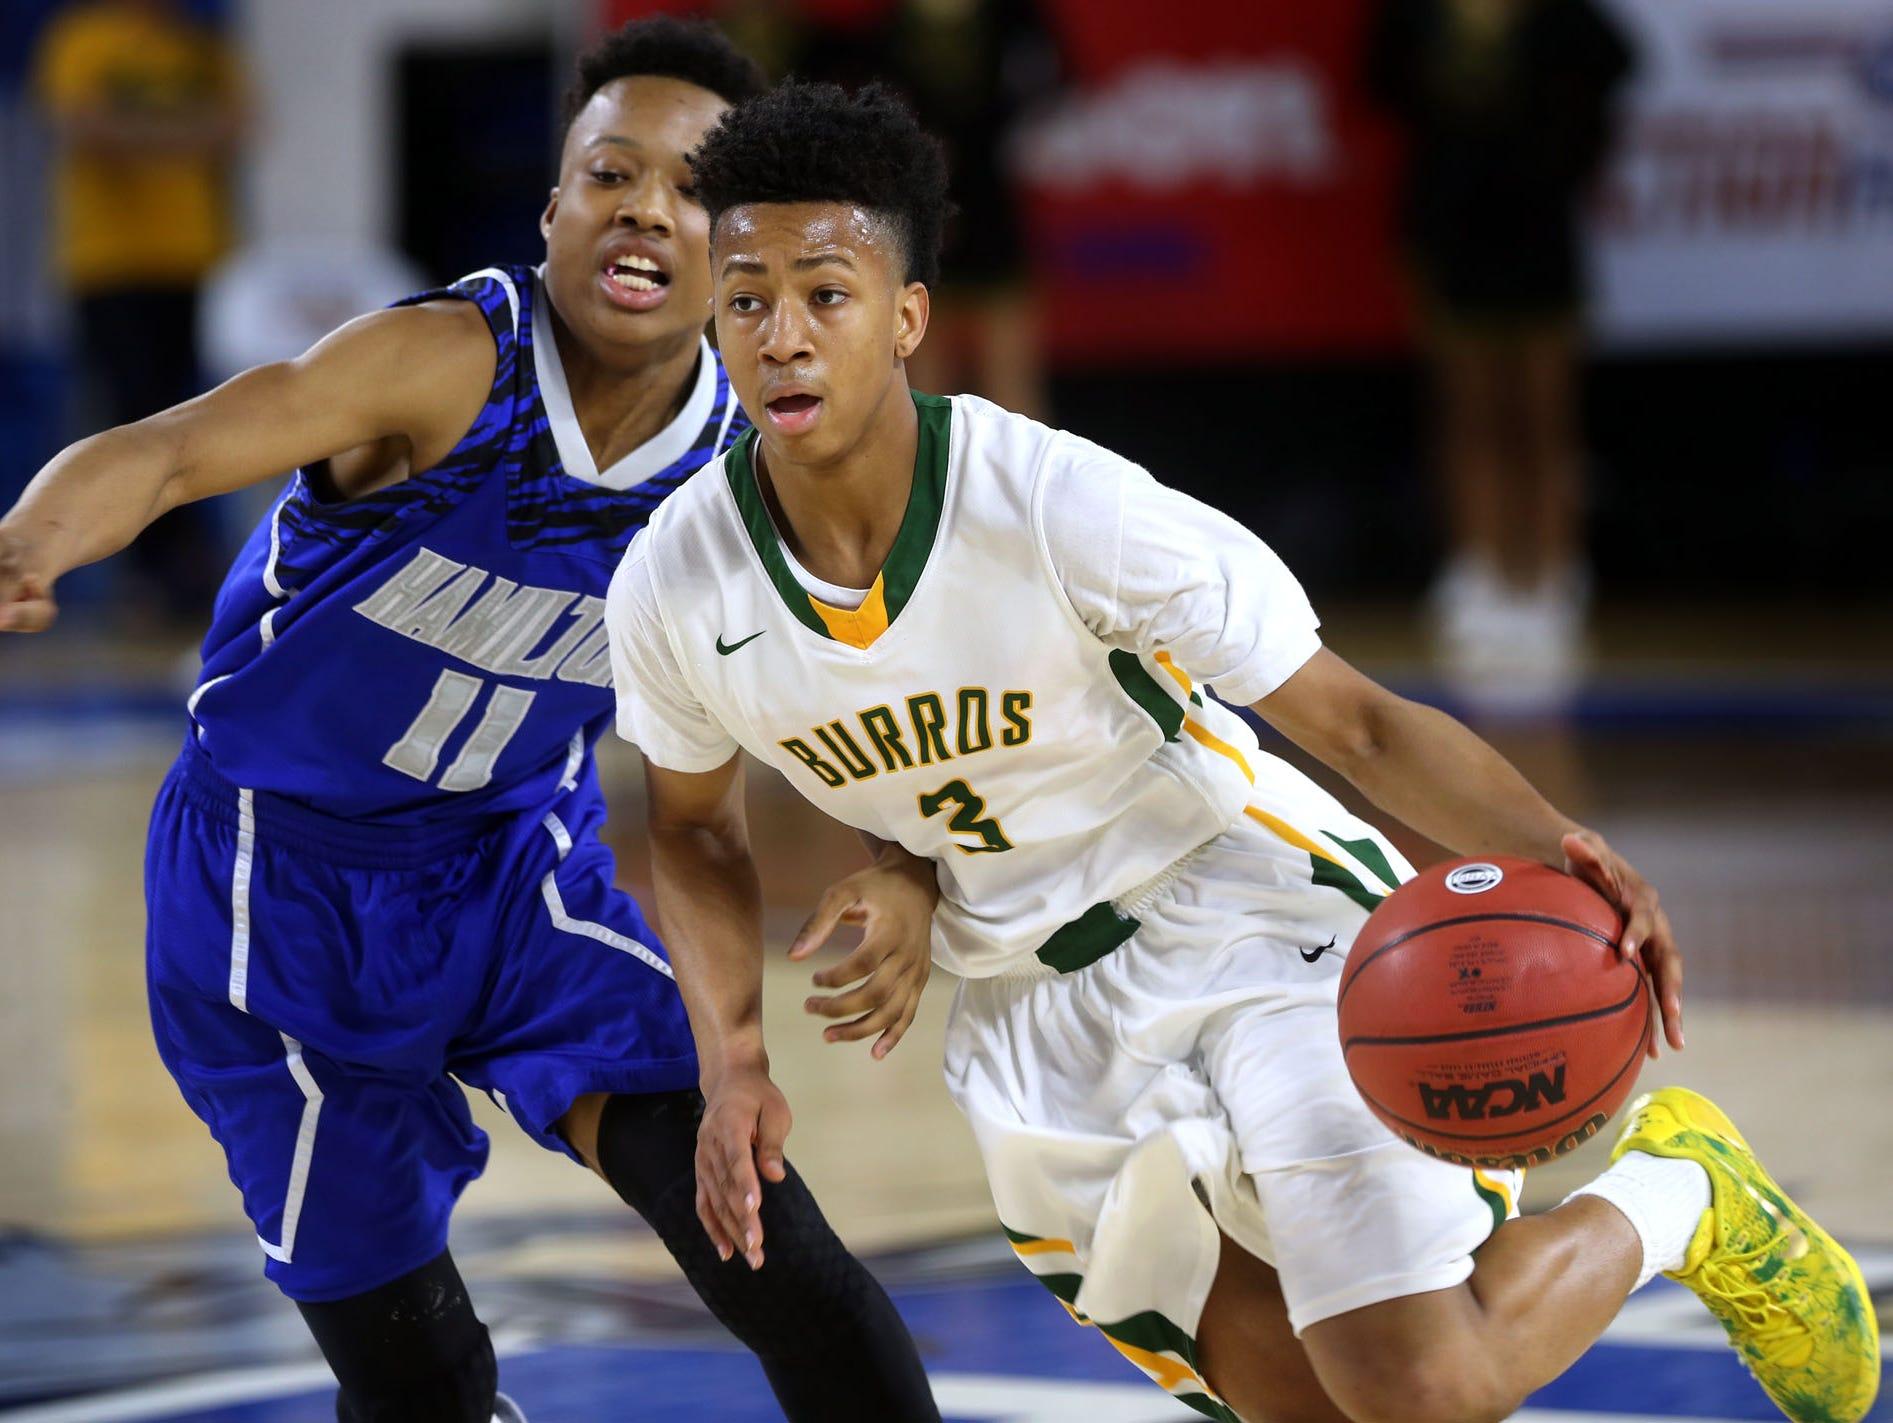 Hillsboro High School's Donovan Donaldson signed with Cumberland University on Thursday